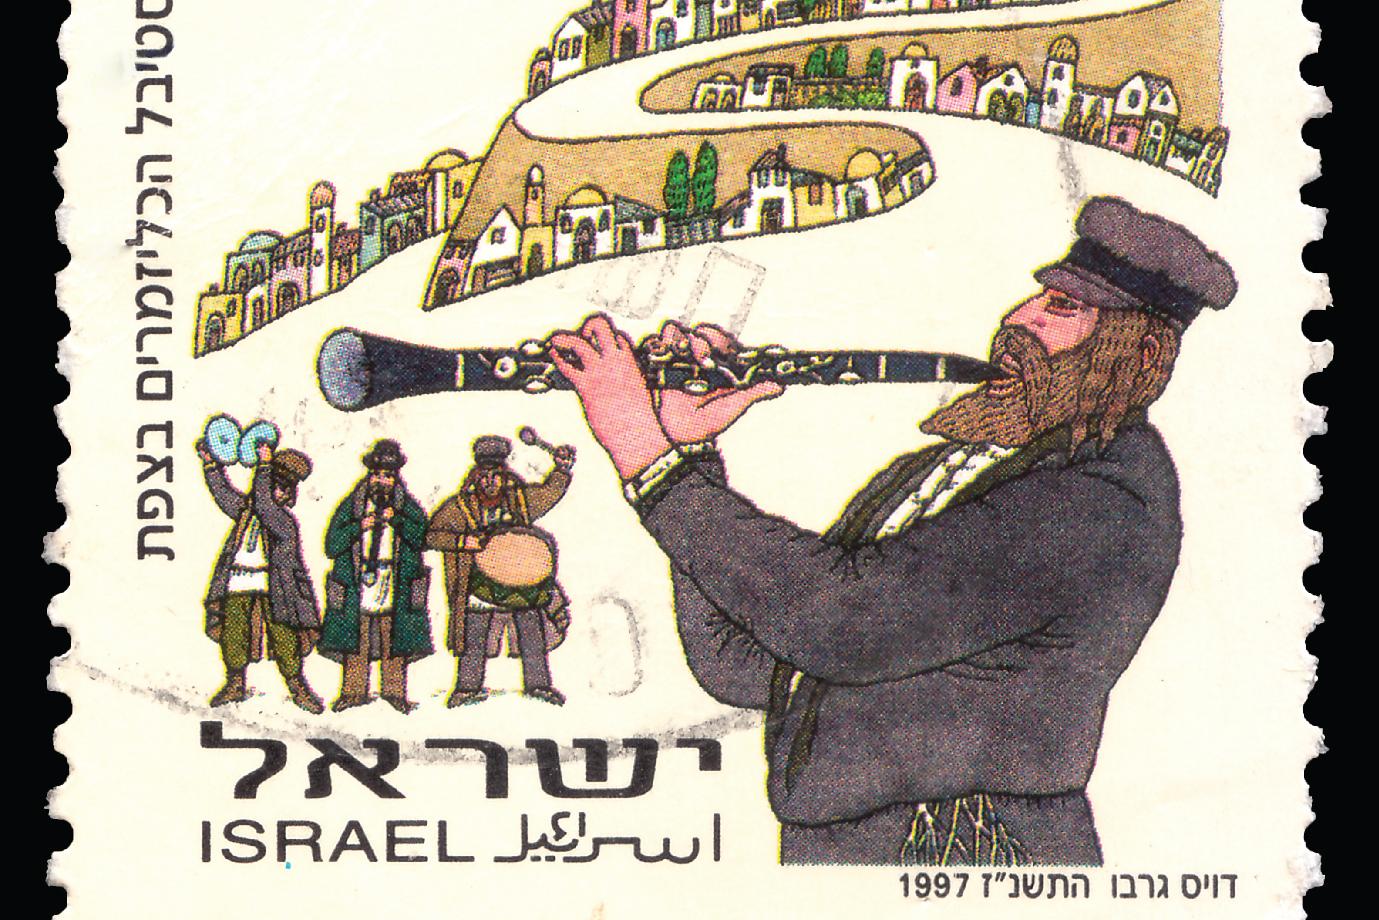 An illustration of Jewish Street Musicians on an Israeli postage stamp